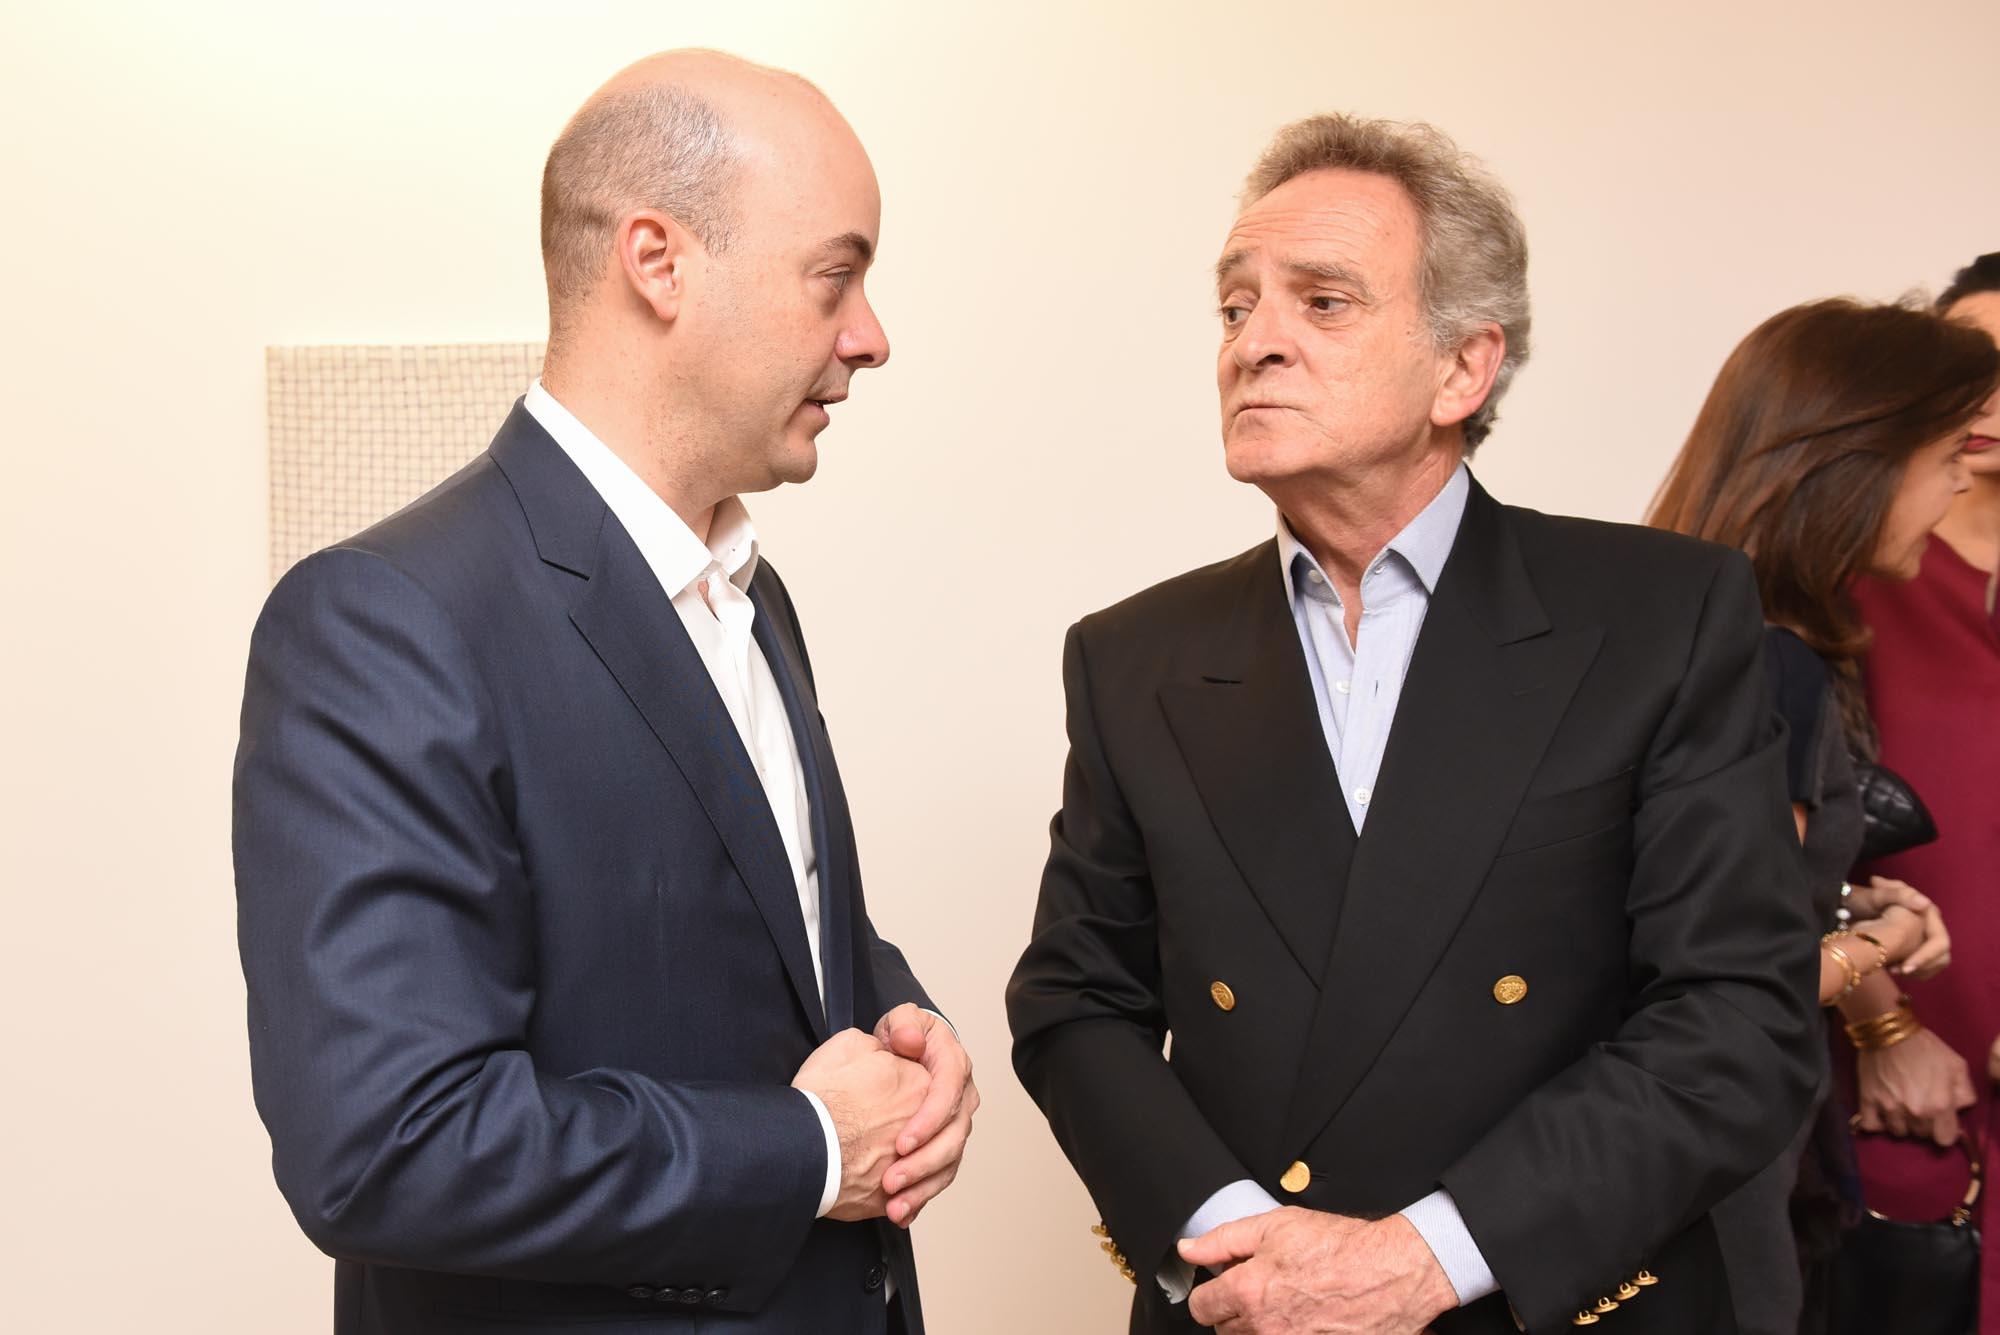 Zeco Auriemo e Michel Jafet_050